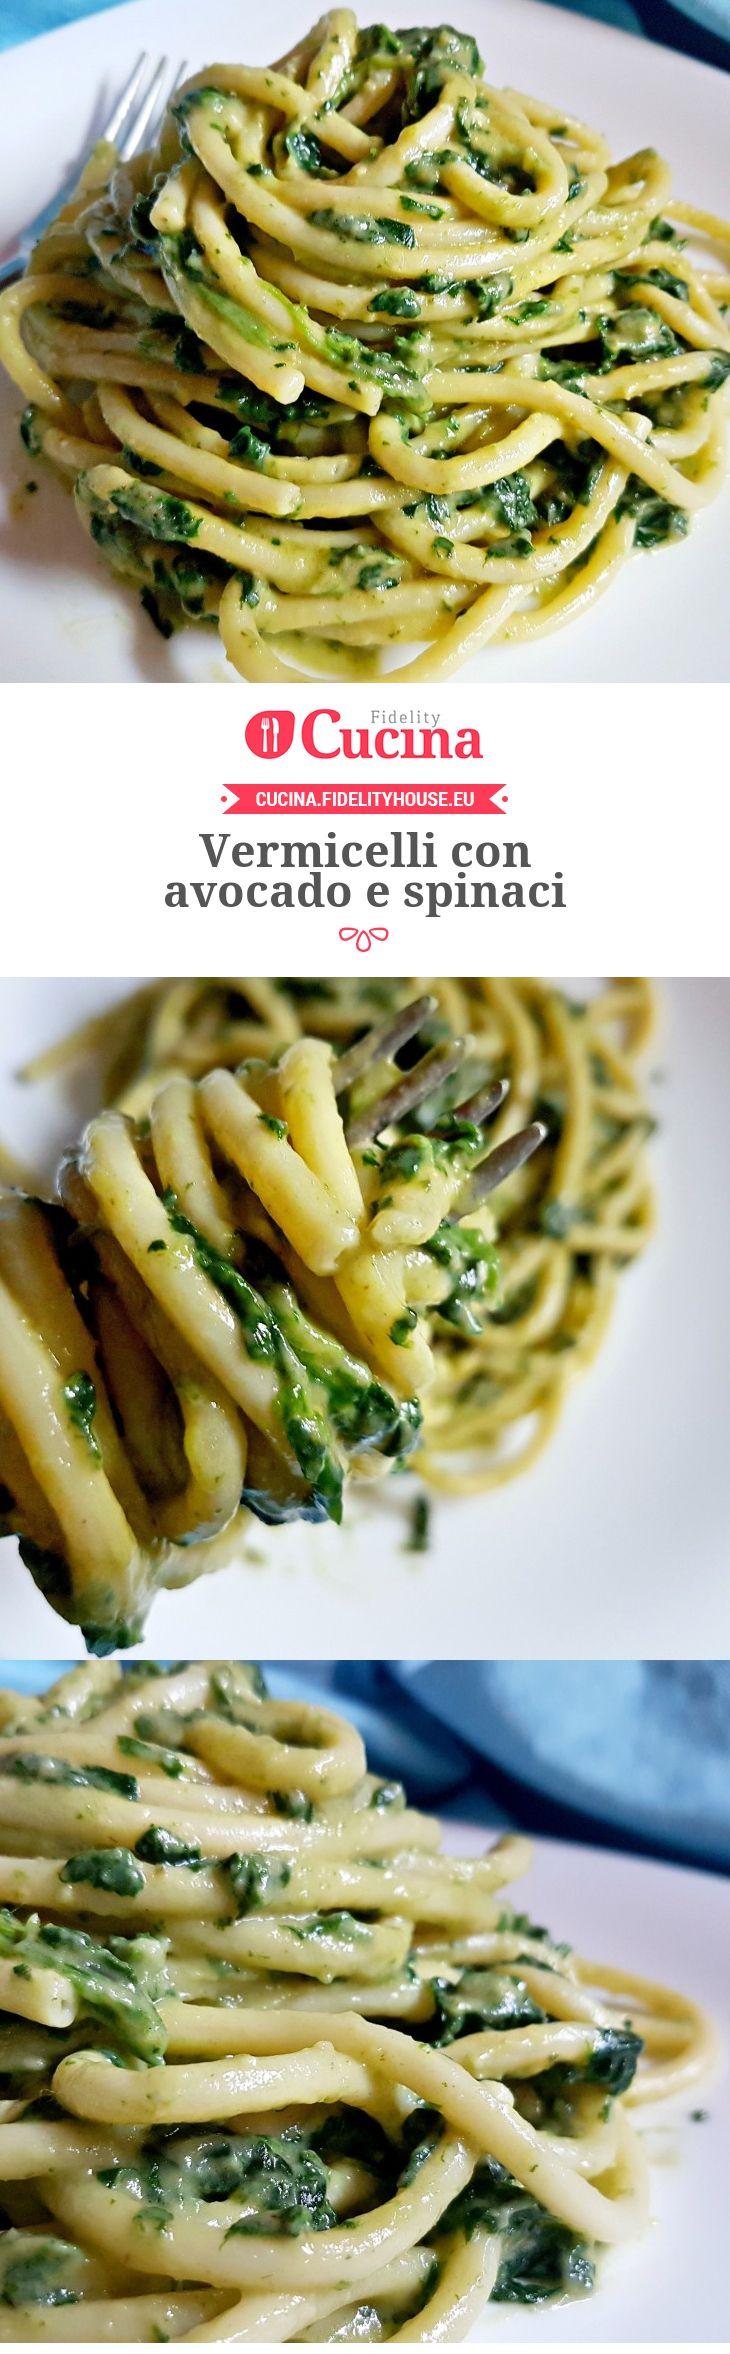 Vermicelli con avocado e spinaci